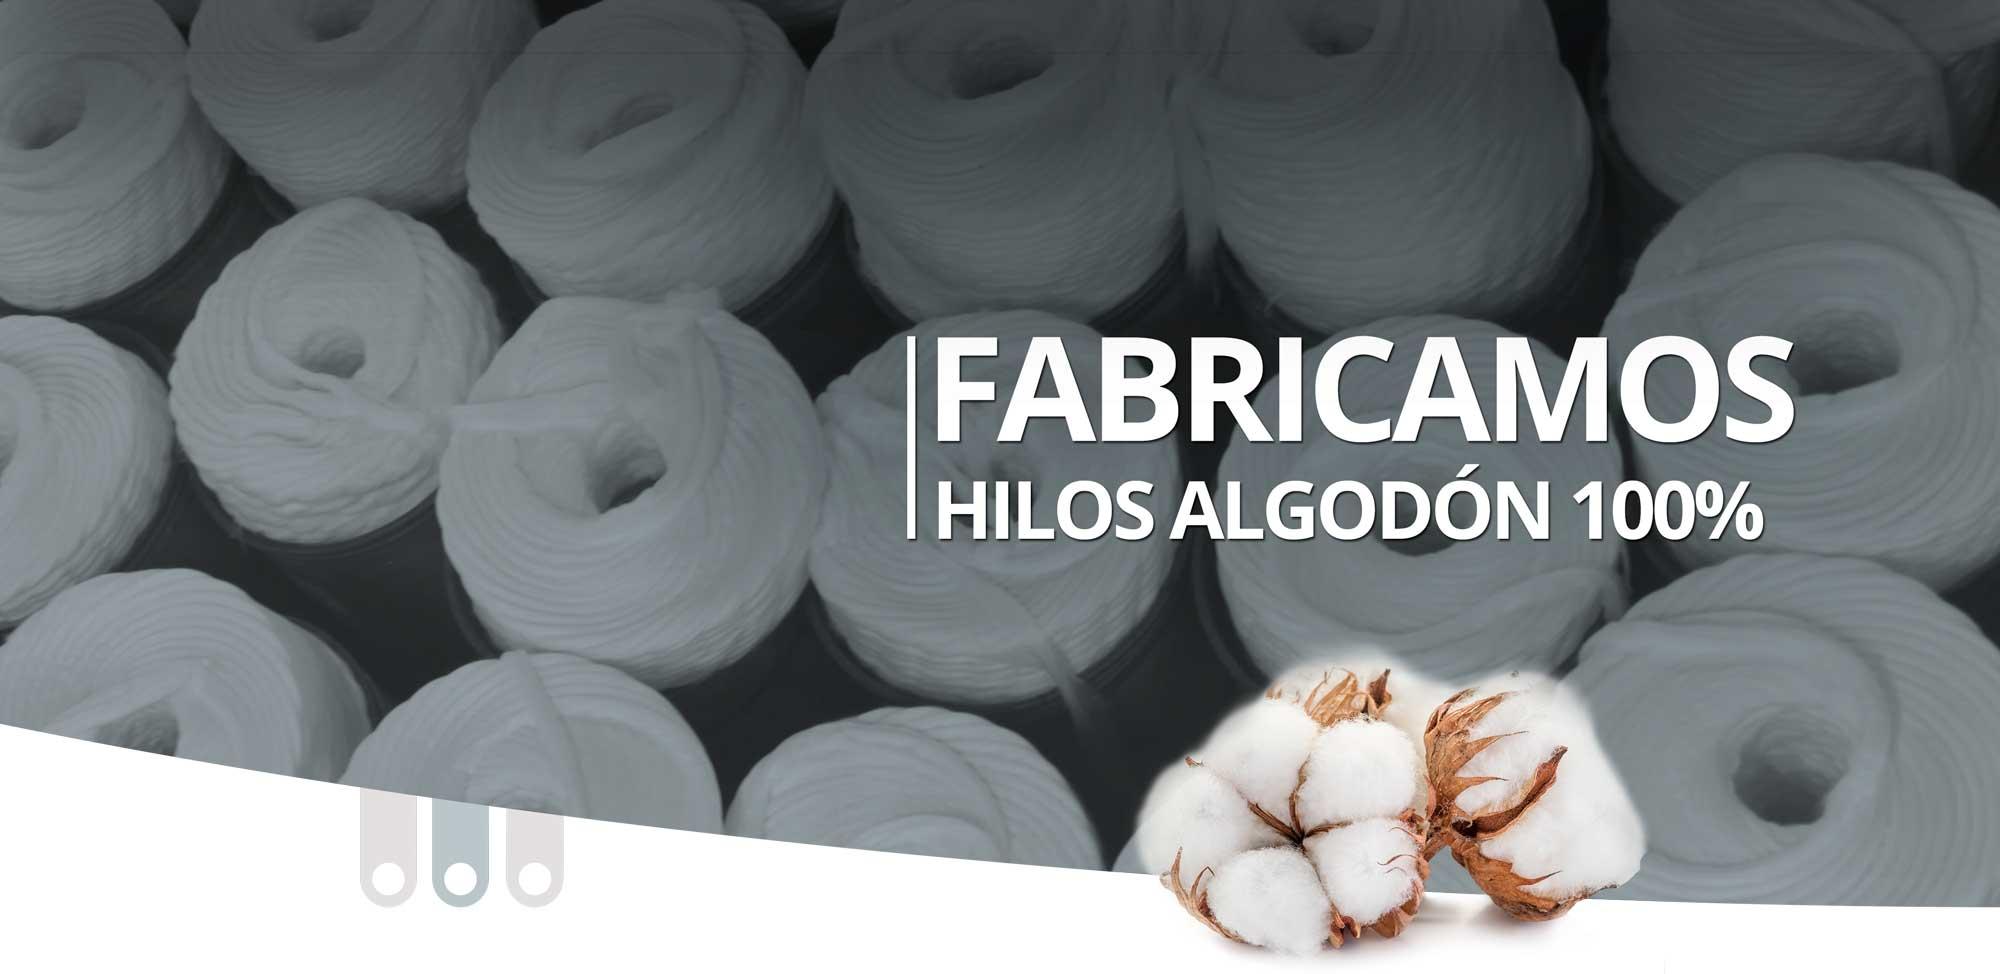 Fabricamos hilos algodon 100%